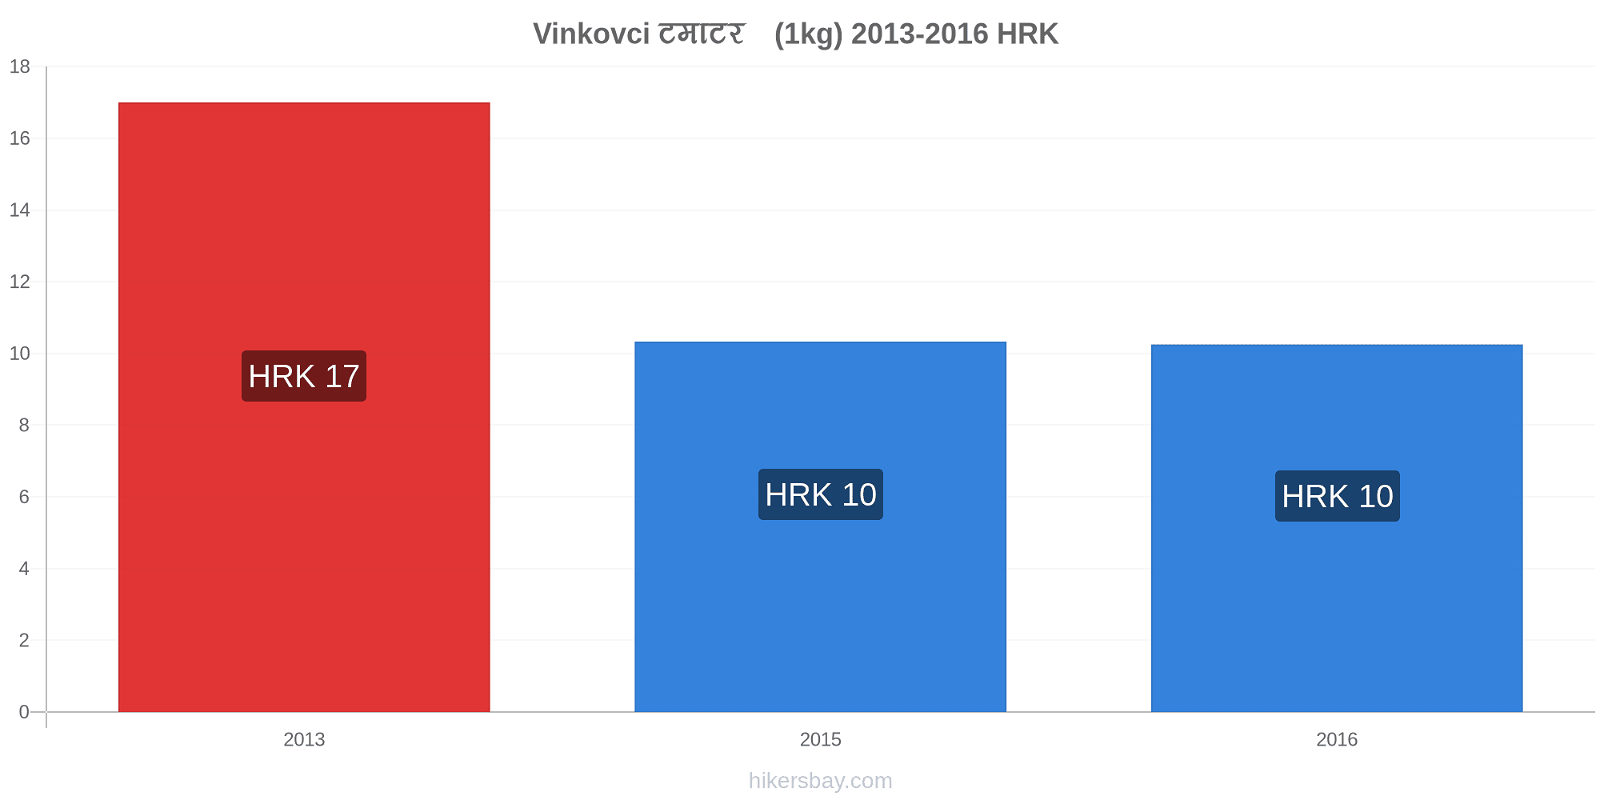 Vinkovci मूल्य परिवर्तन टमाटर (1kg) hikersbay.com